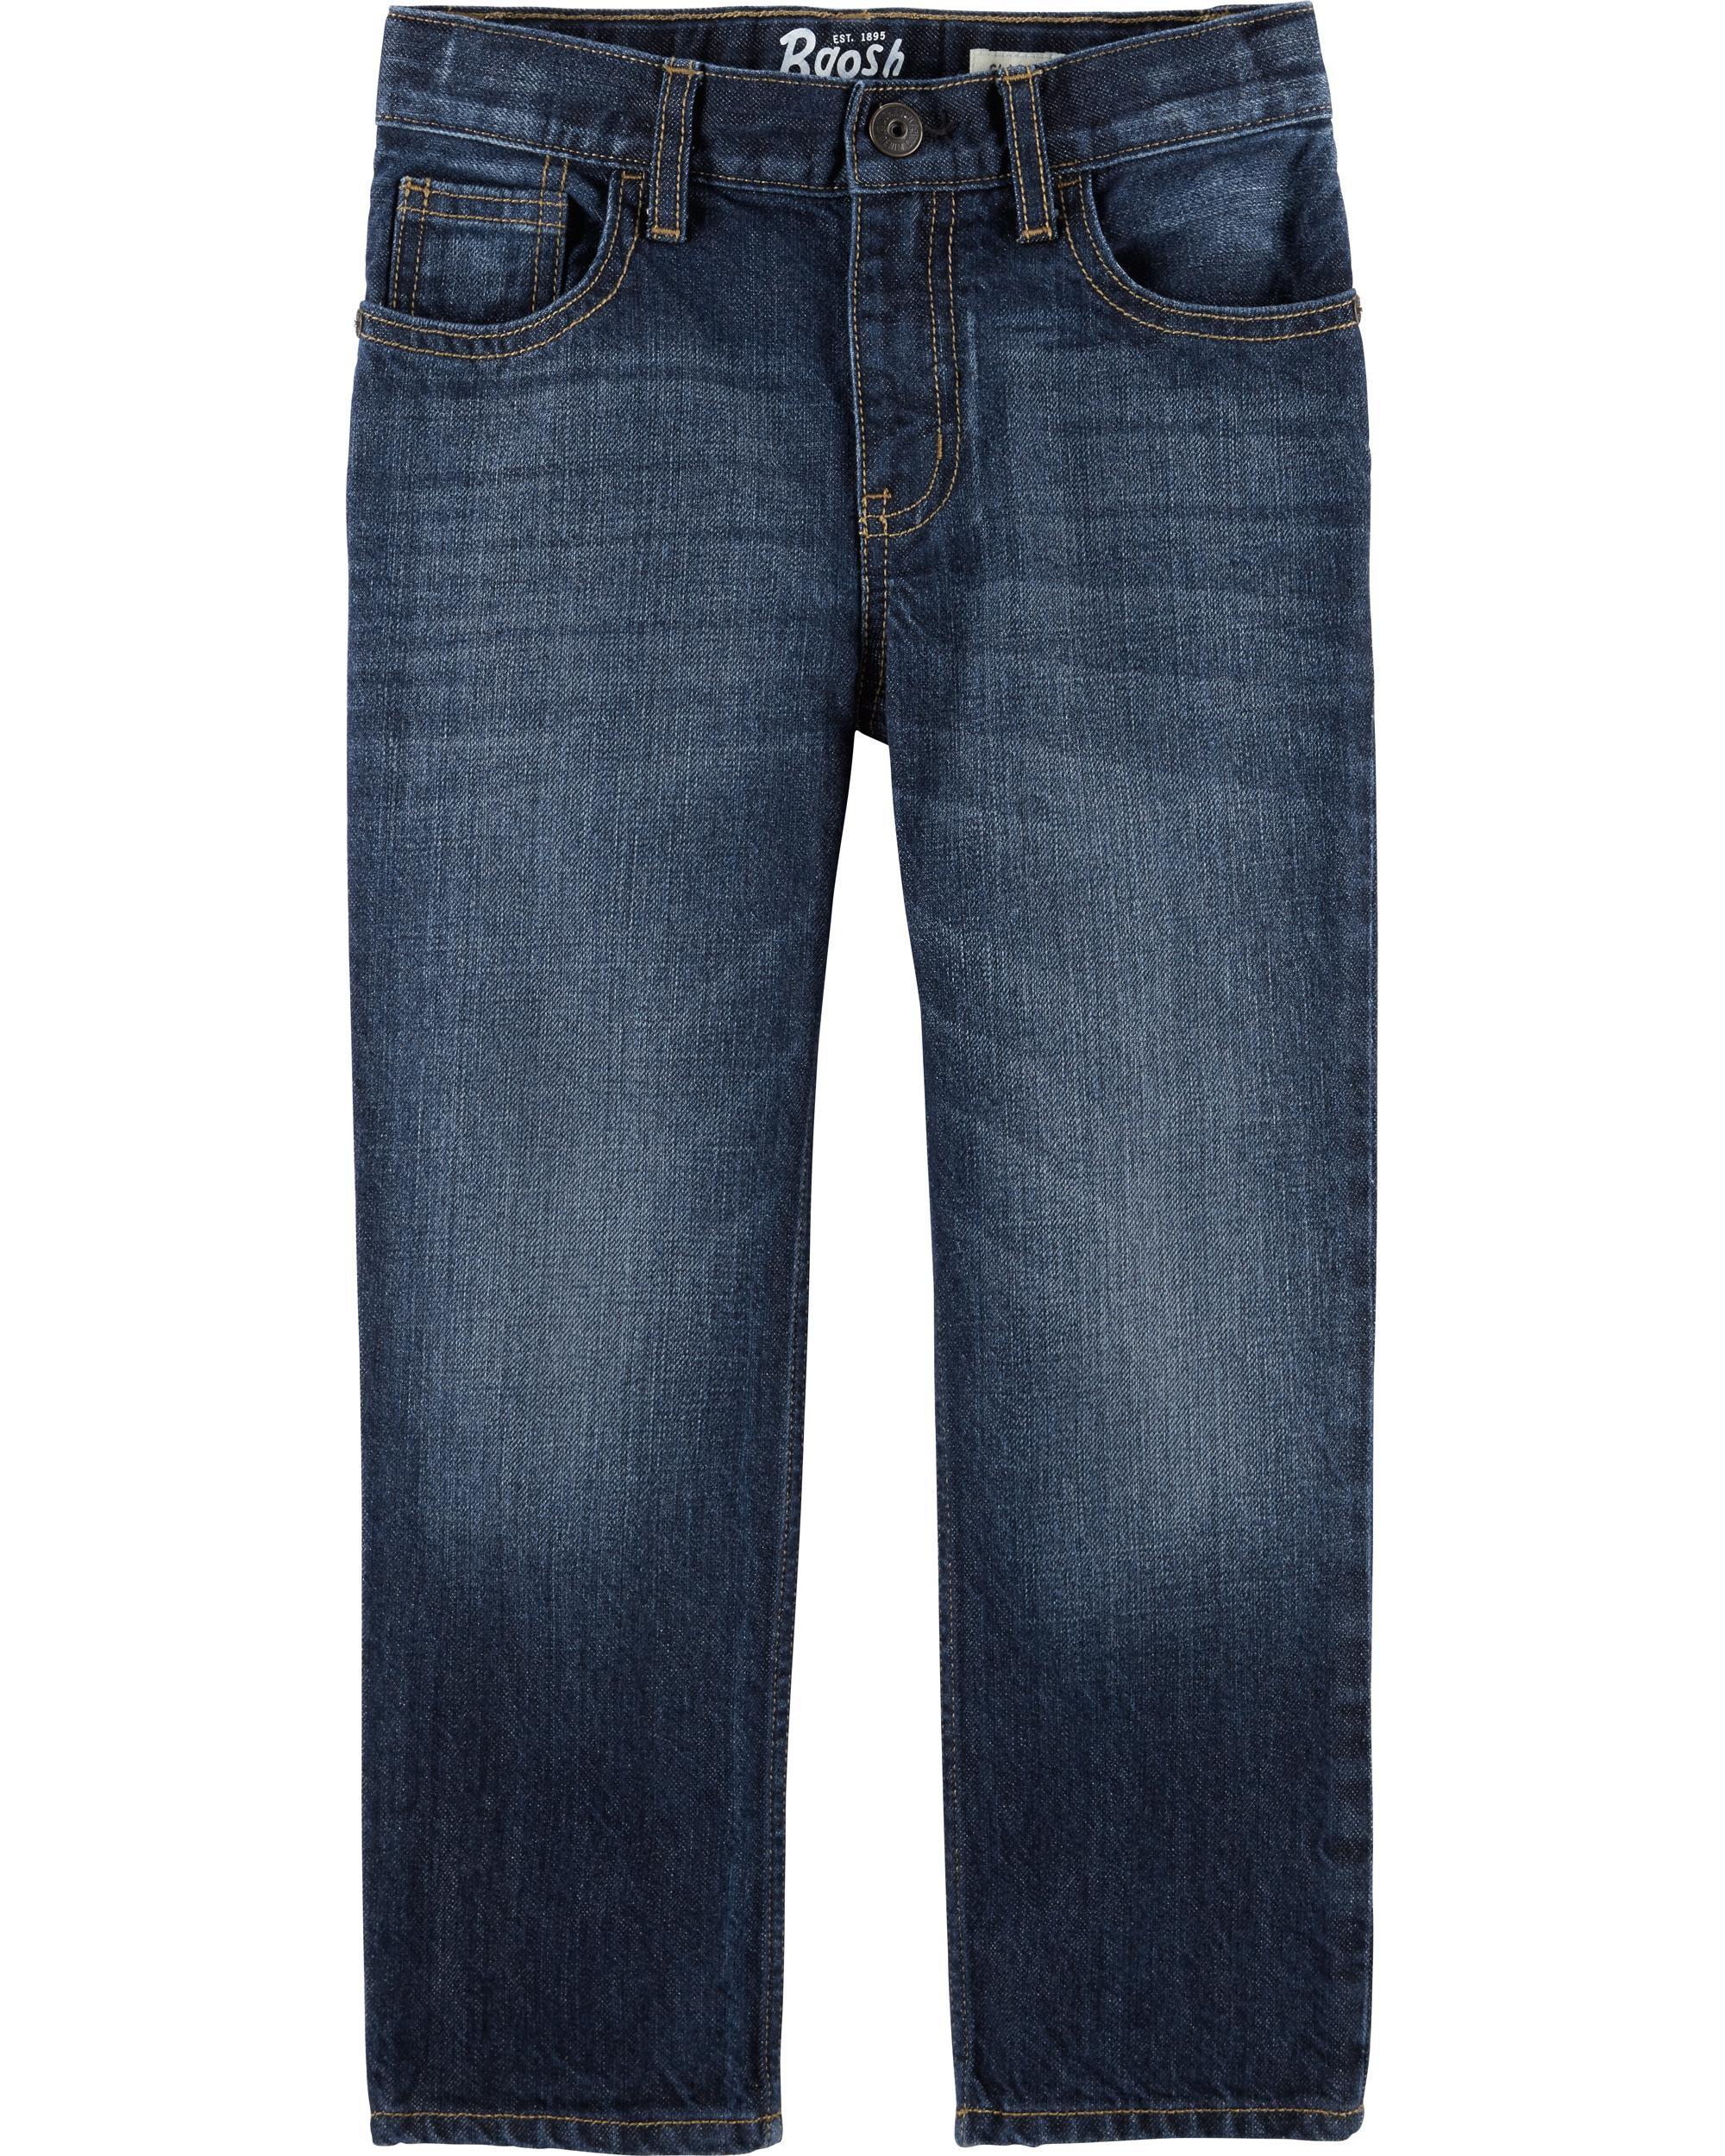 *DOORBUSTER* Classic Jeans - Tumbled Medium Faded Wash